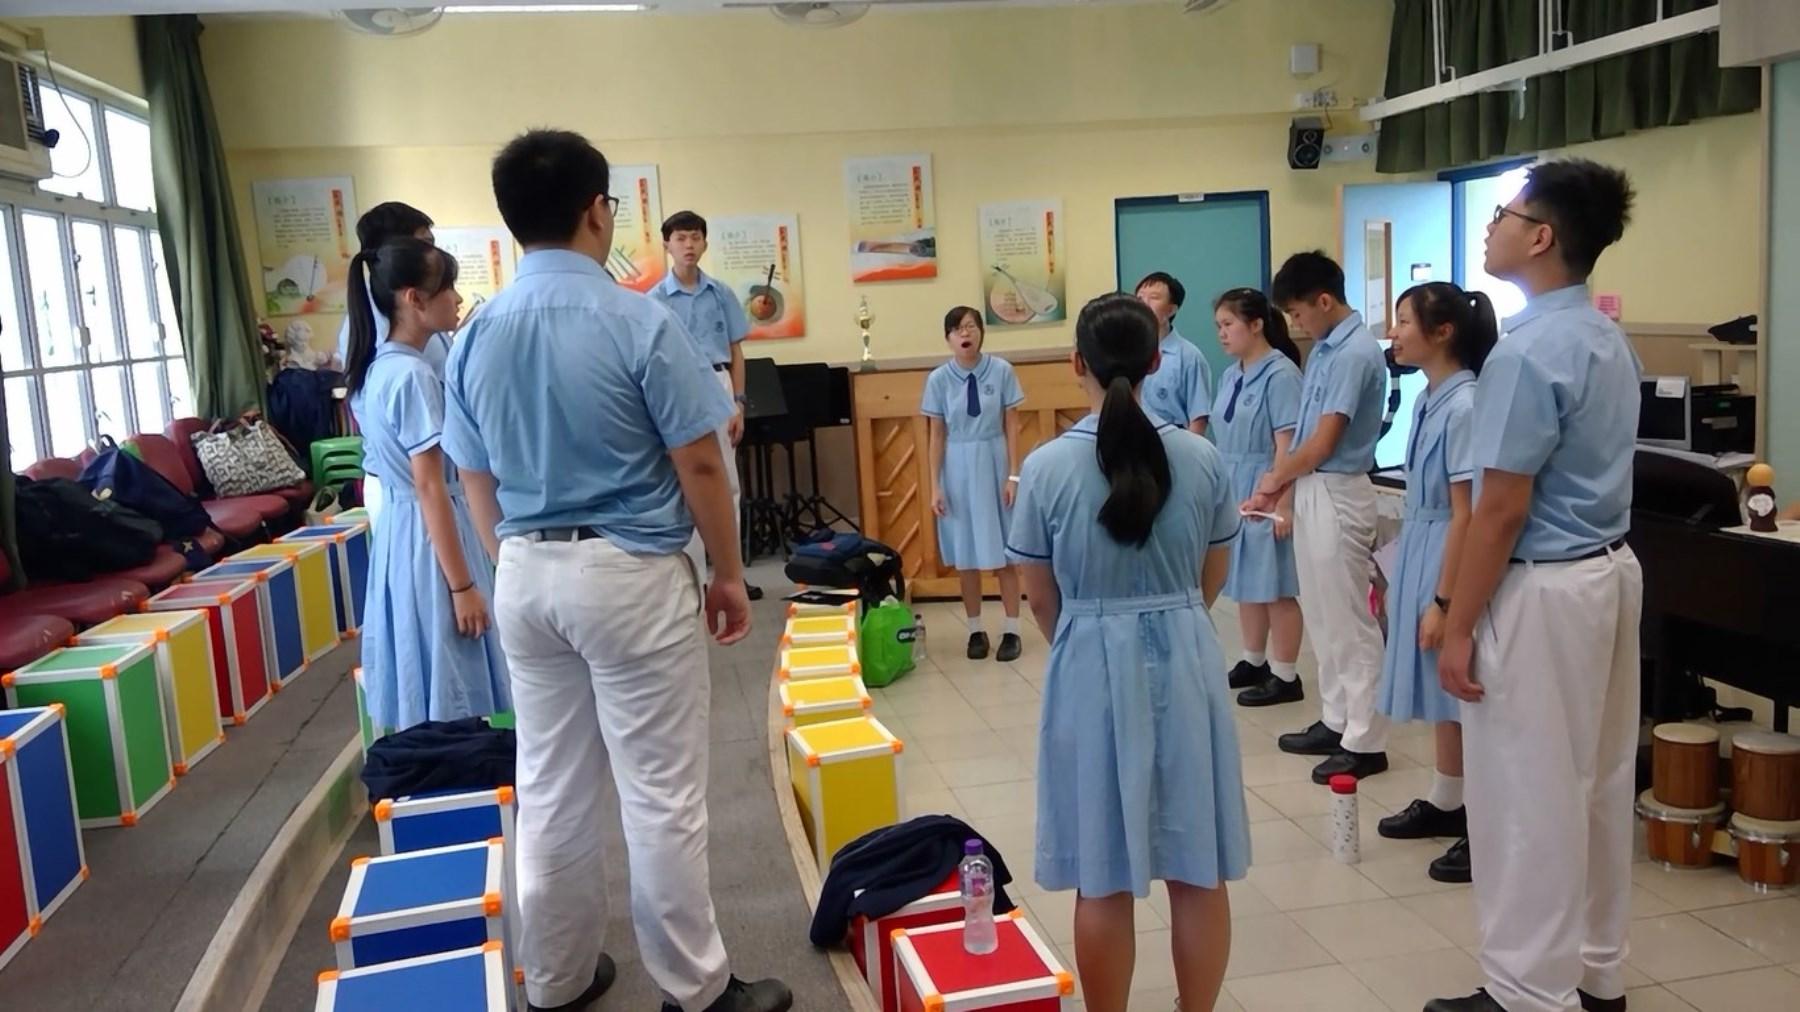 http://npc.edu.hk/sites/default/files/005_1.jpg